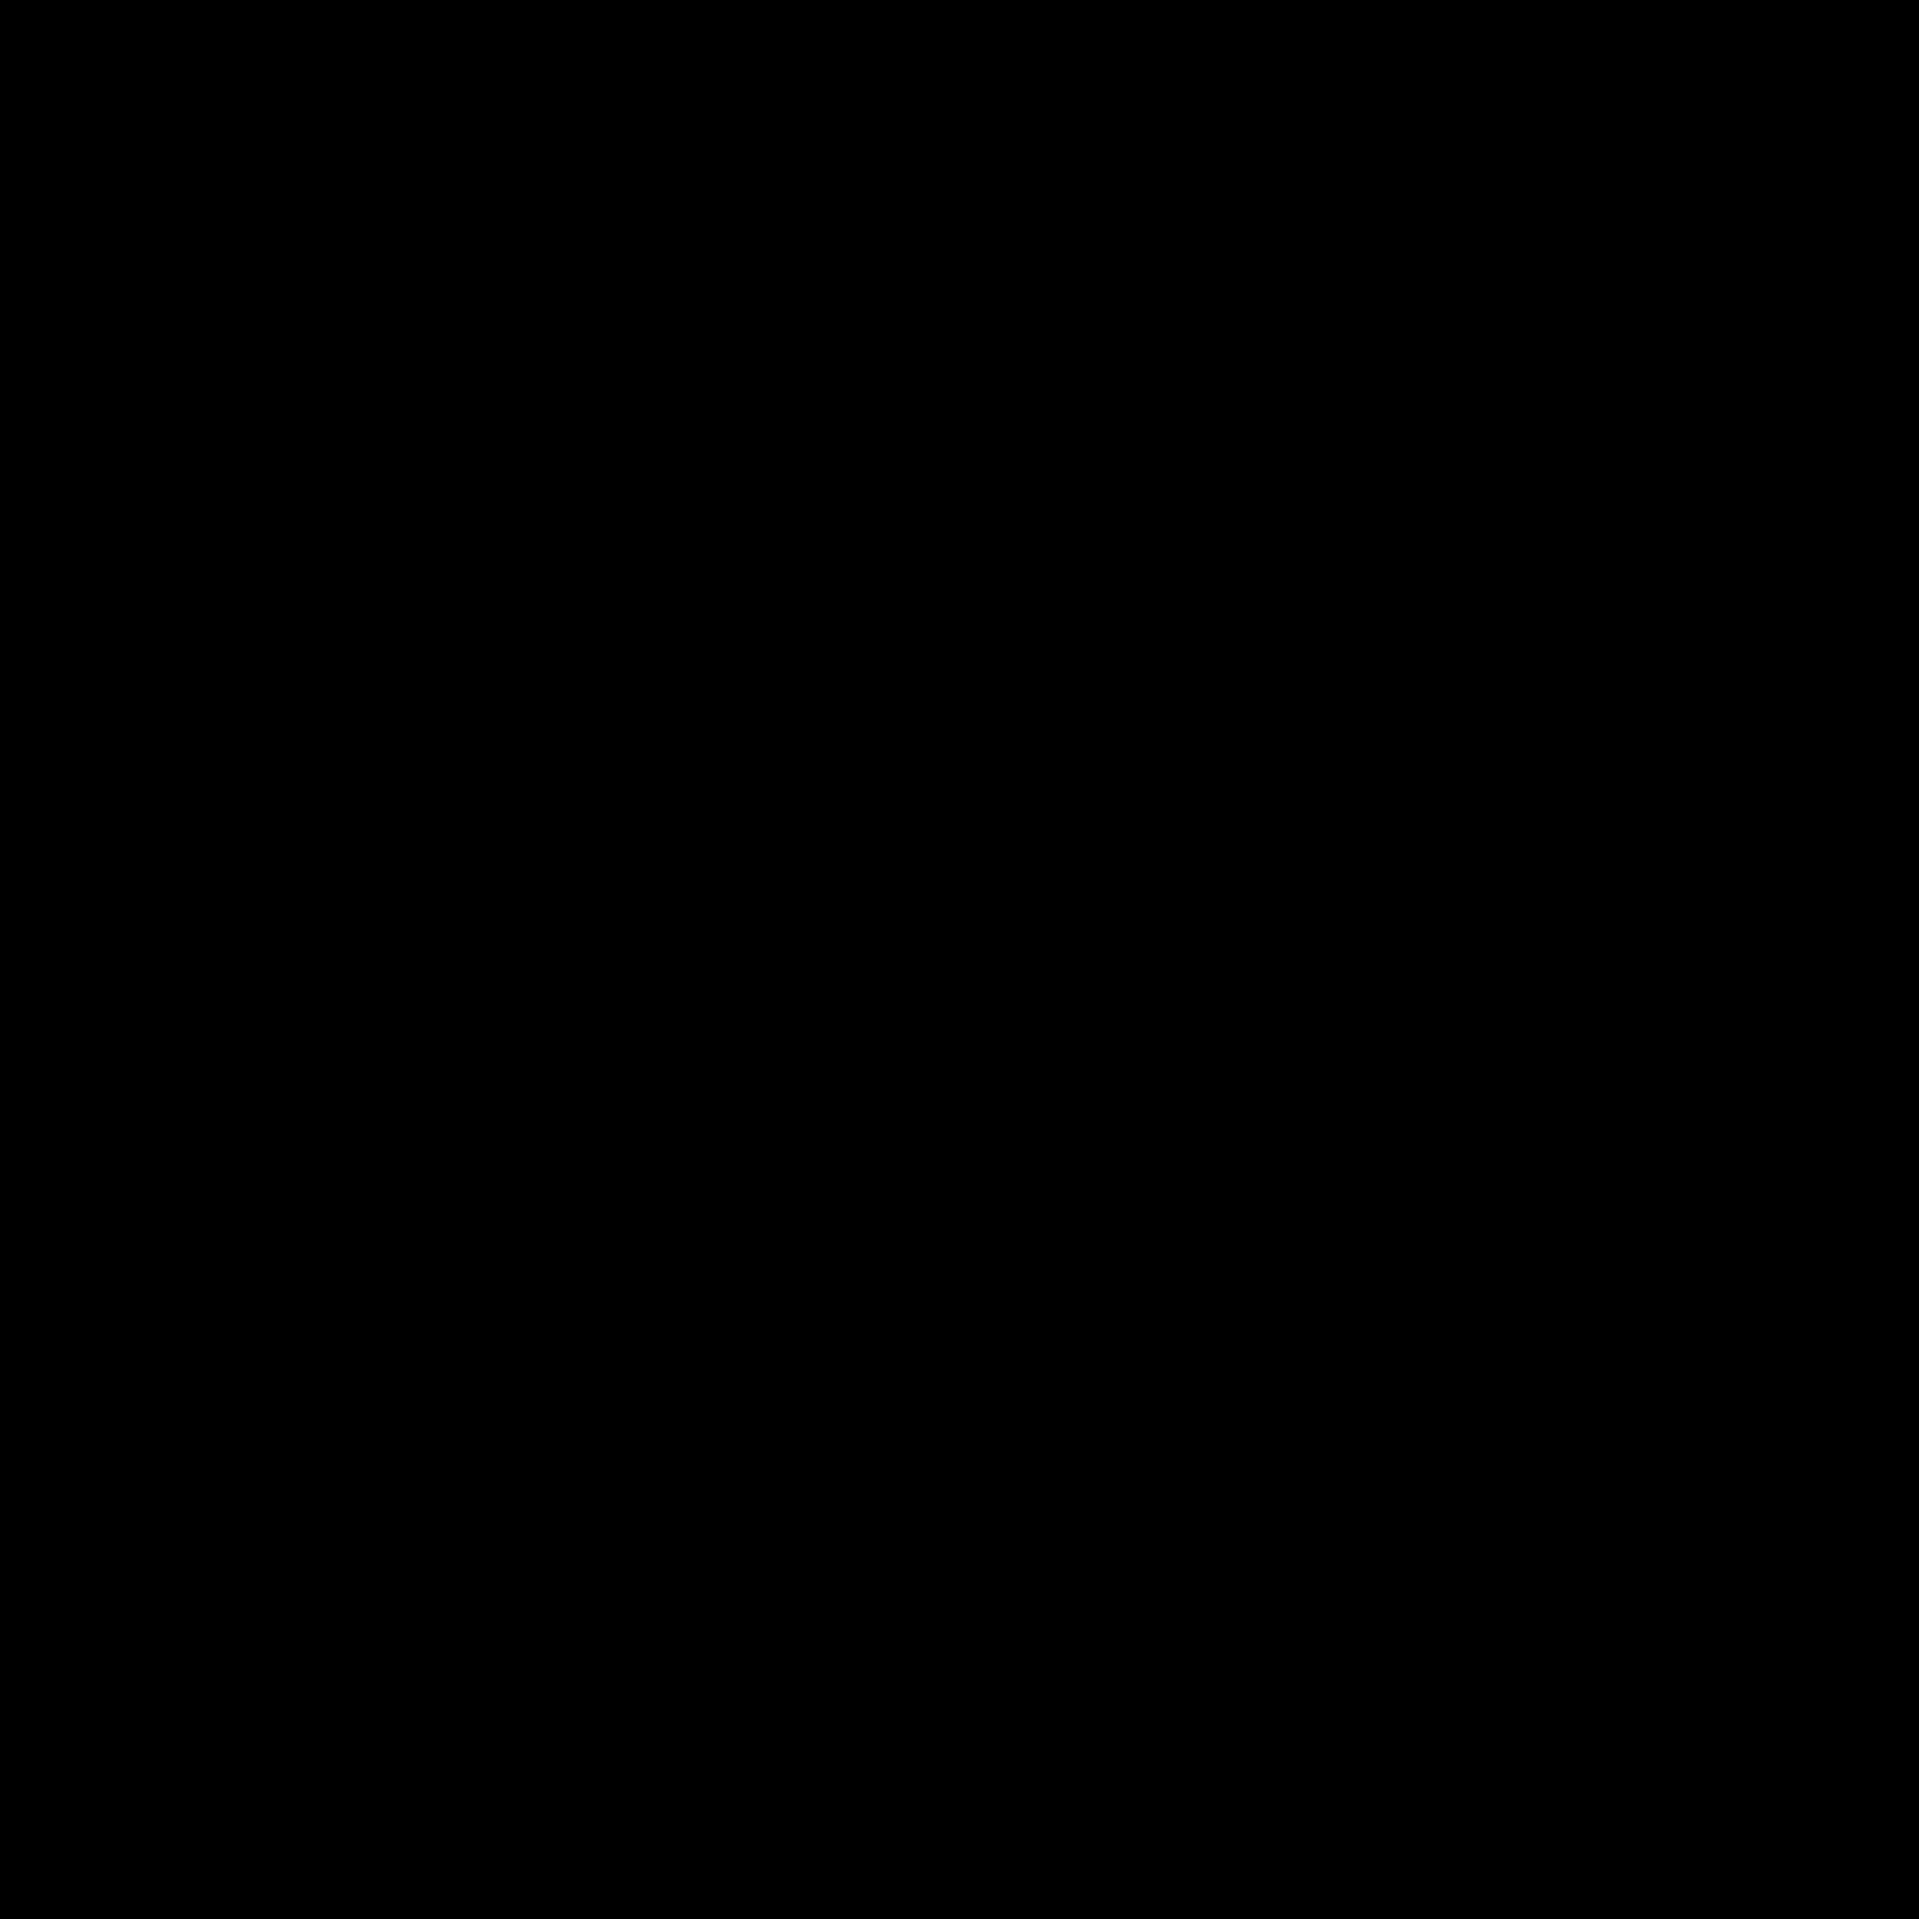 Shop Inspect Icon